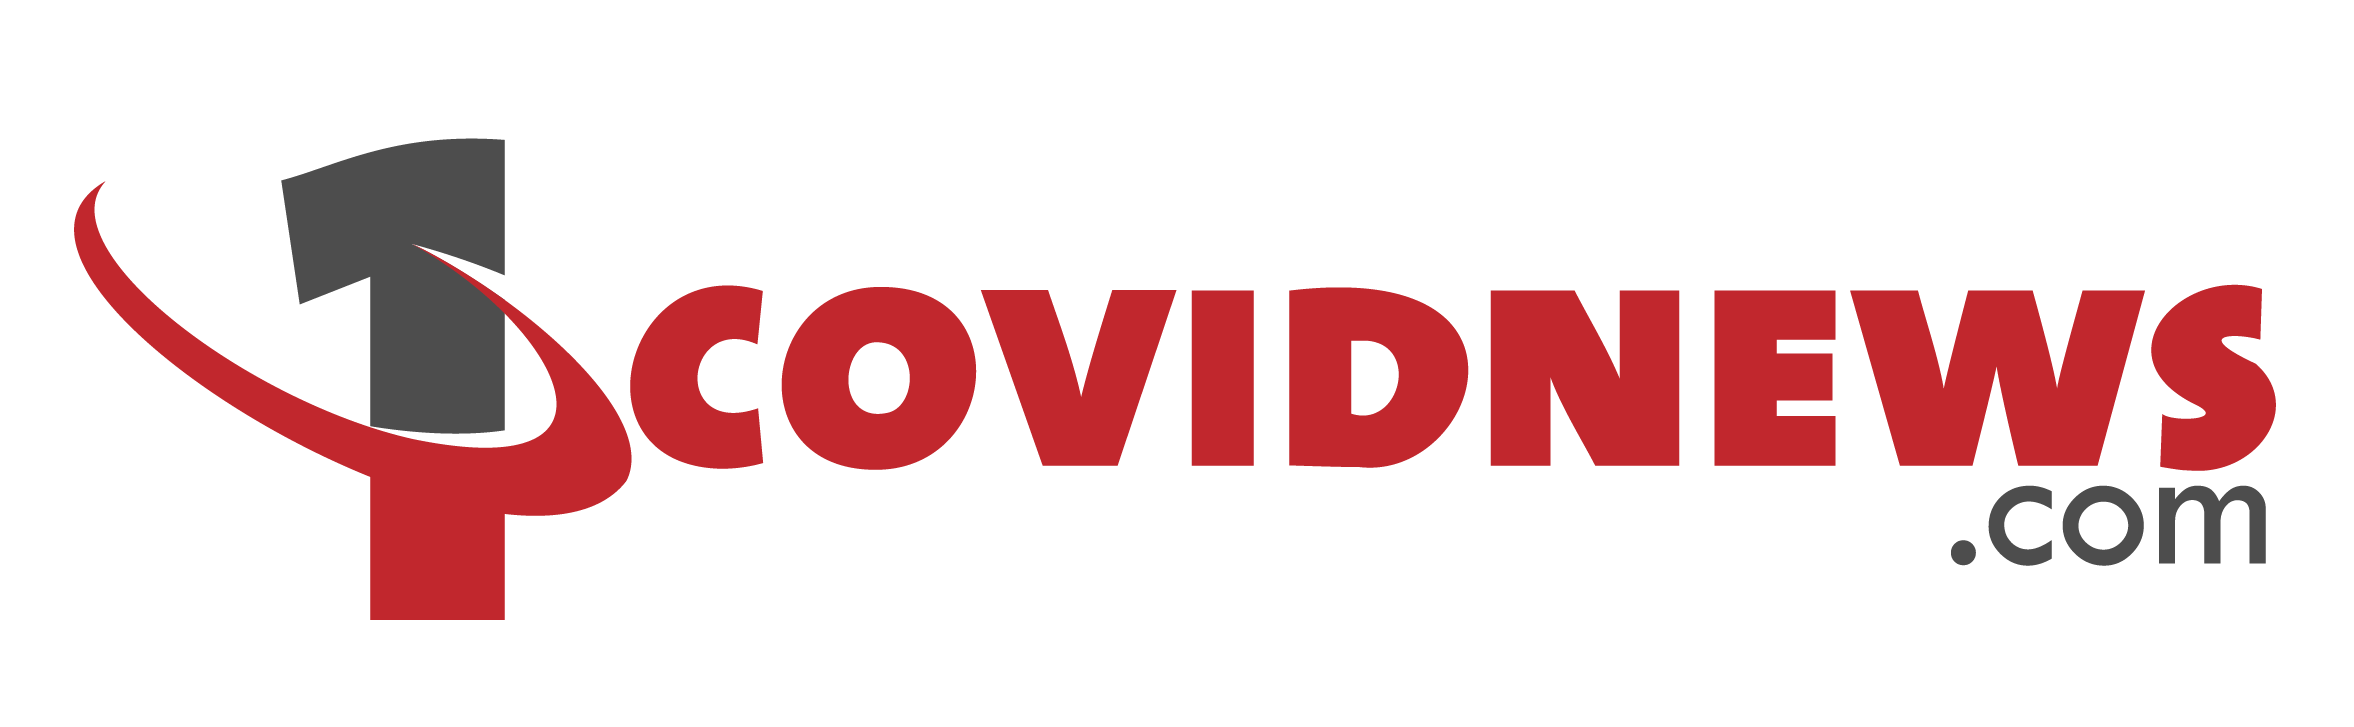 1CovidNews